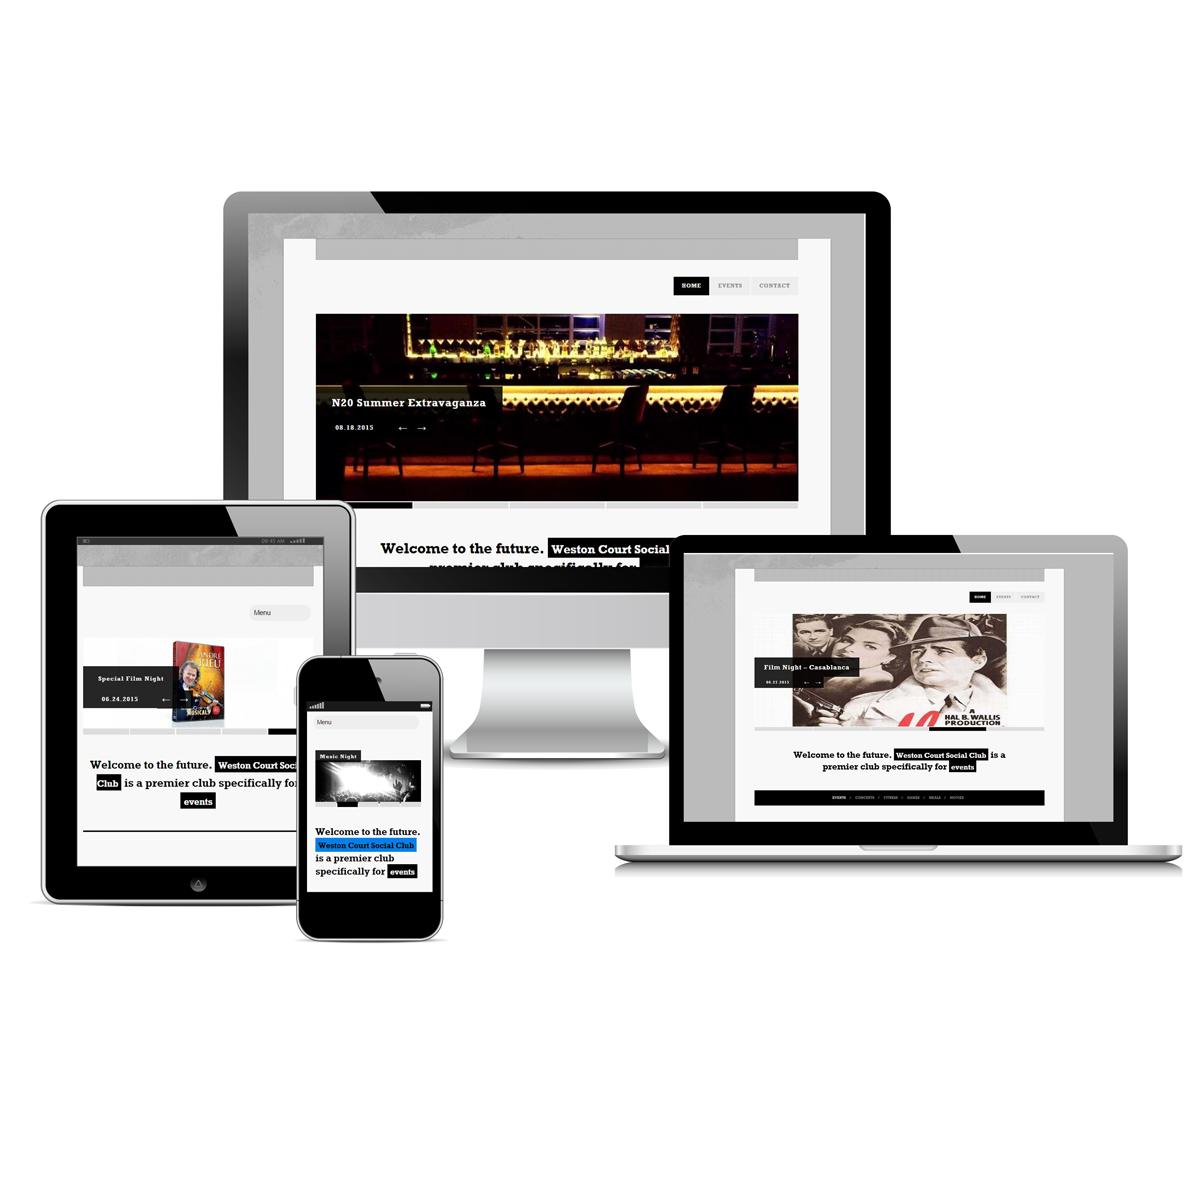 Weston Court Social Club Entertainment Website